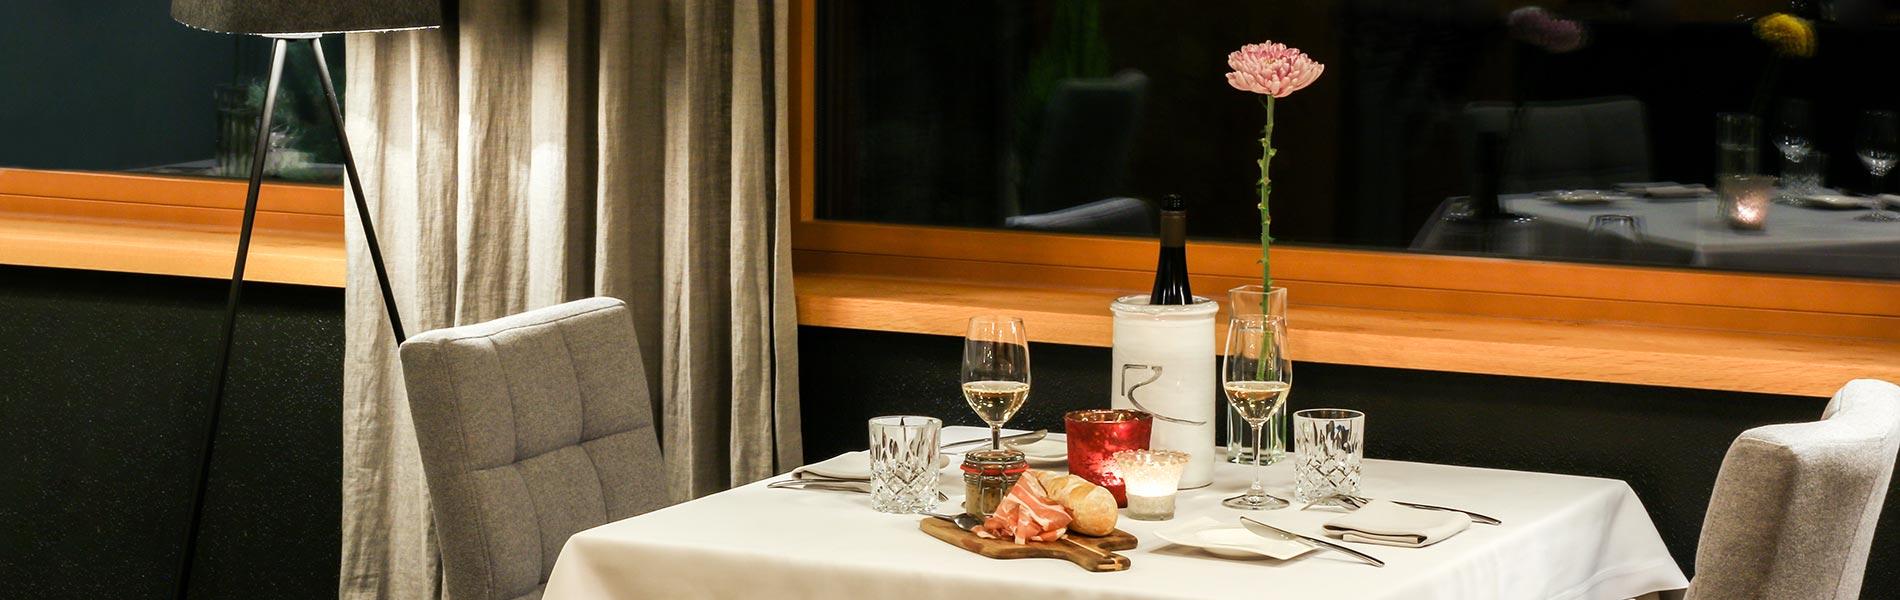 Bistro Restaurant Simon Taxacher Hotel Rosengarten 5 Sterne Hotel Relais & Châteaux Hotel Kirchberg Tirol Austria